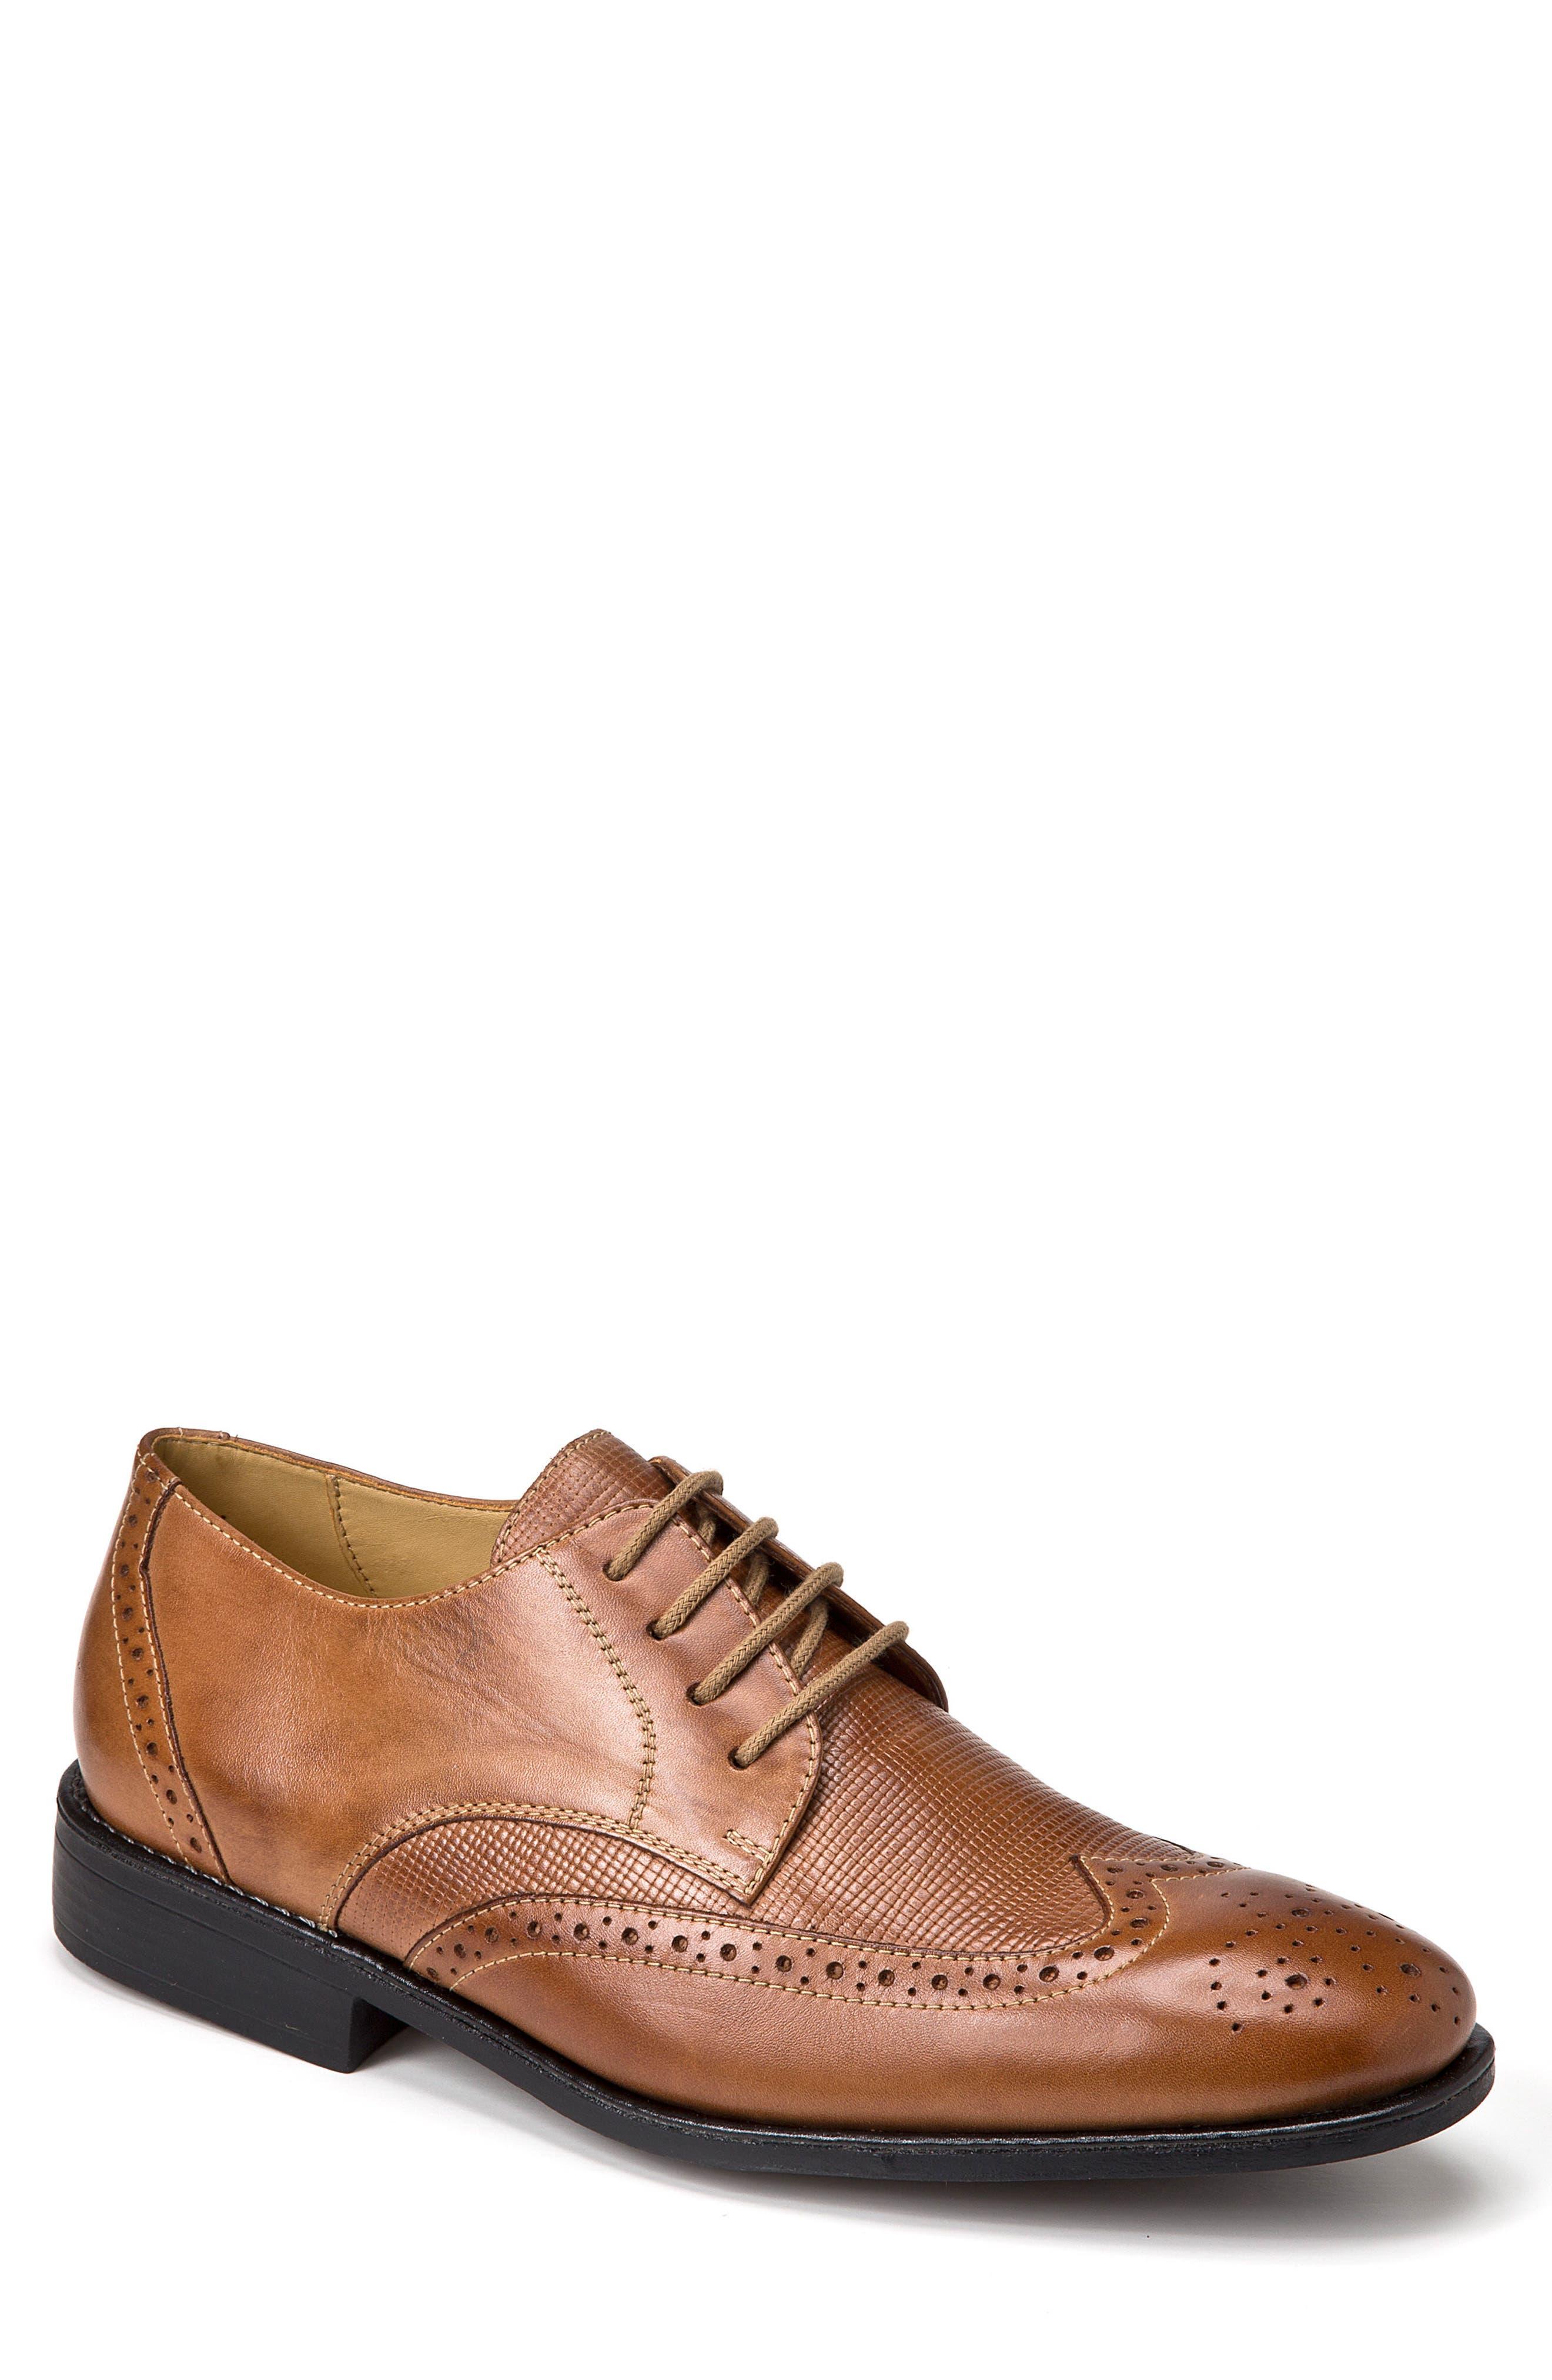 Donovan Wingtip,                         Main,                         color, Tan Leather